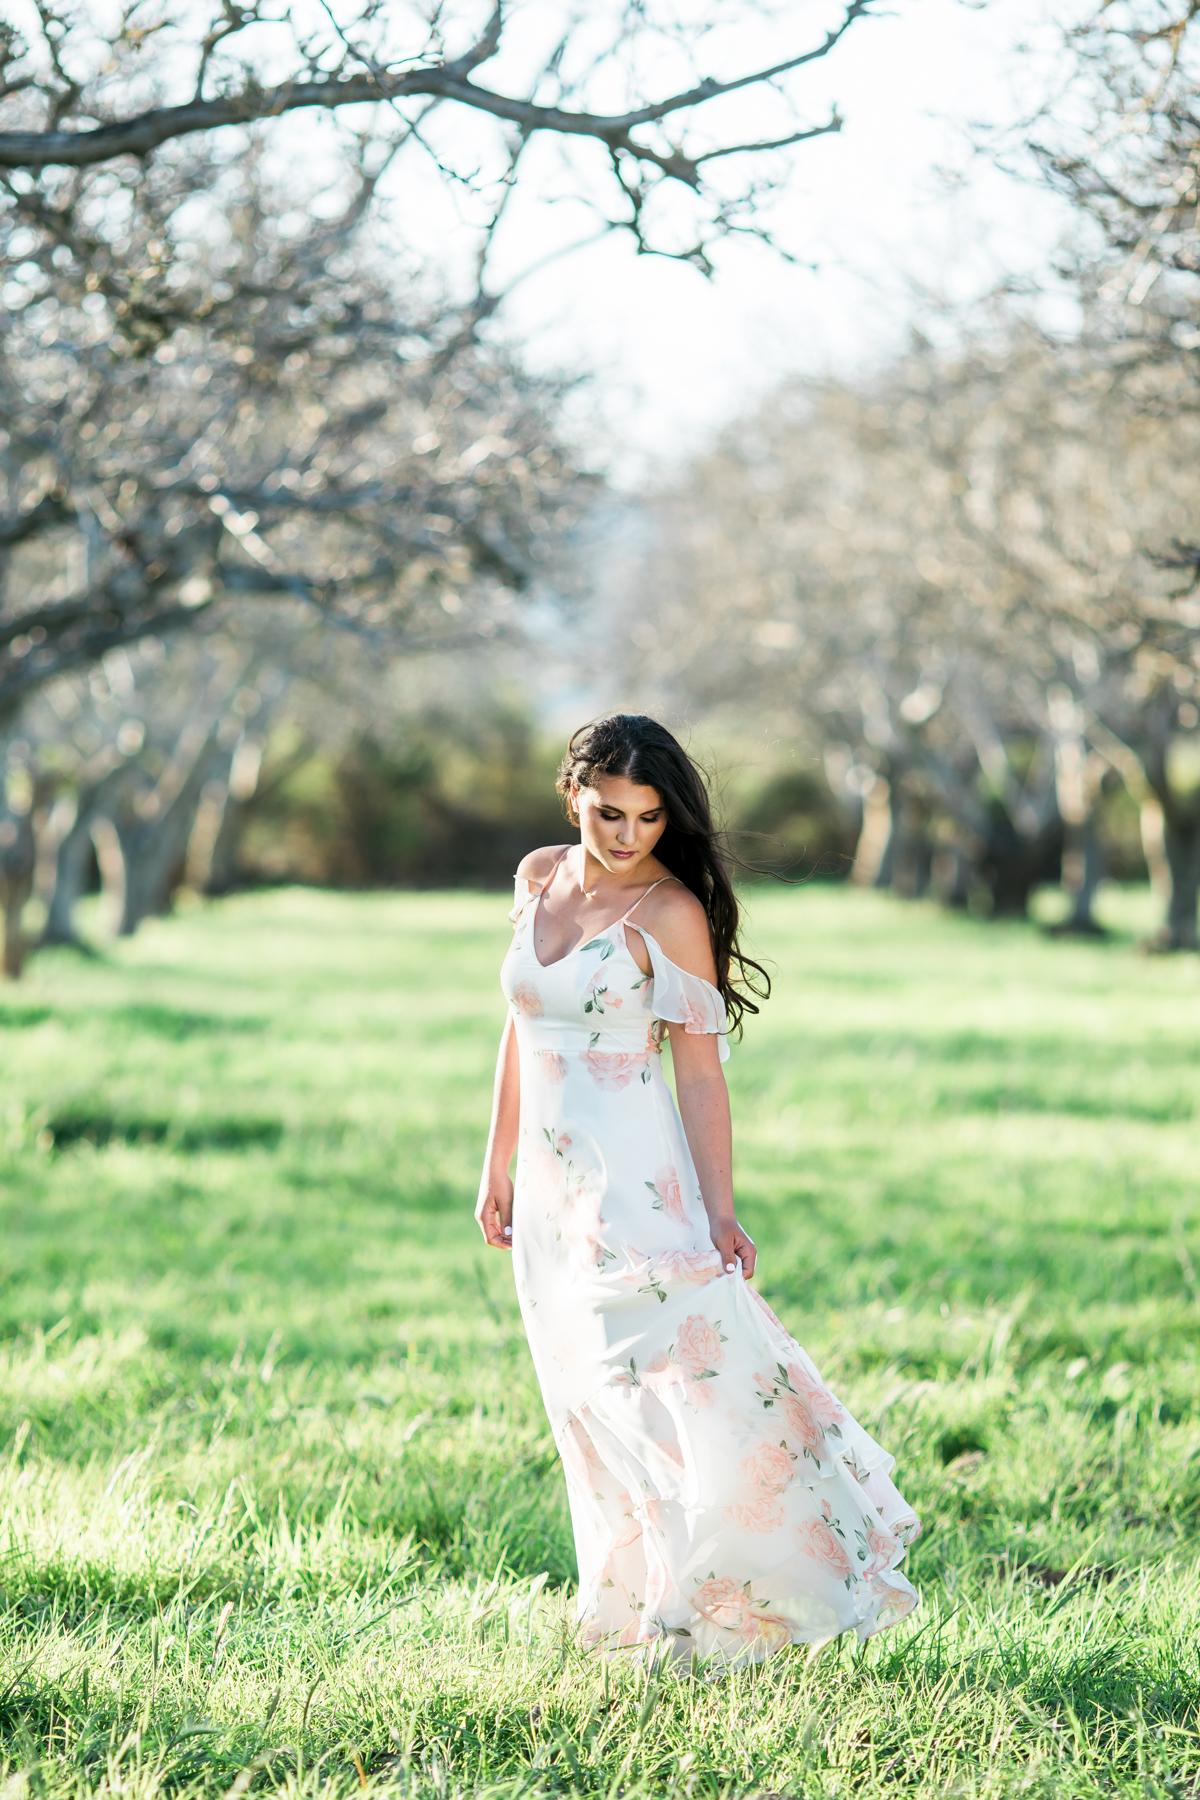 jillianmariephotography_californiaseniorportraits_Sadie-6.jpg